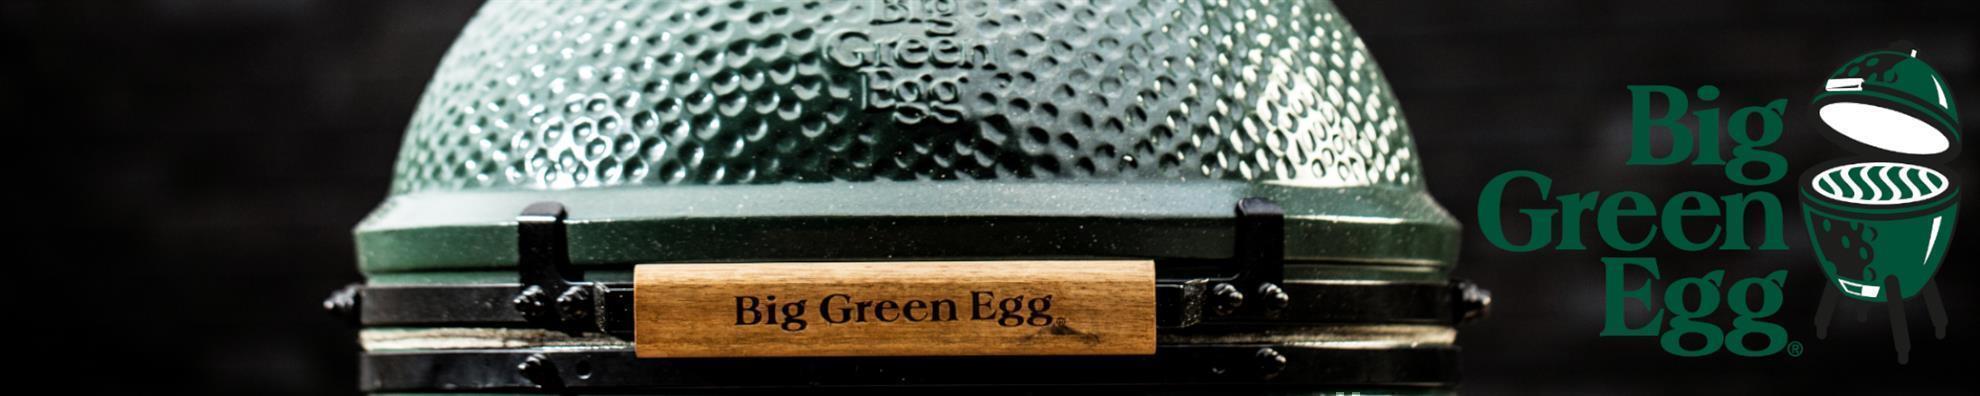 Big Green Egg - ConvEGGtor MiniMax